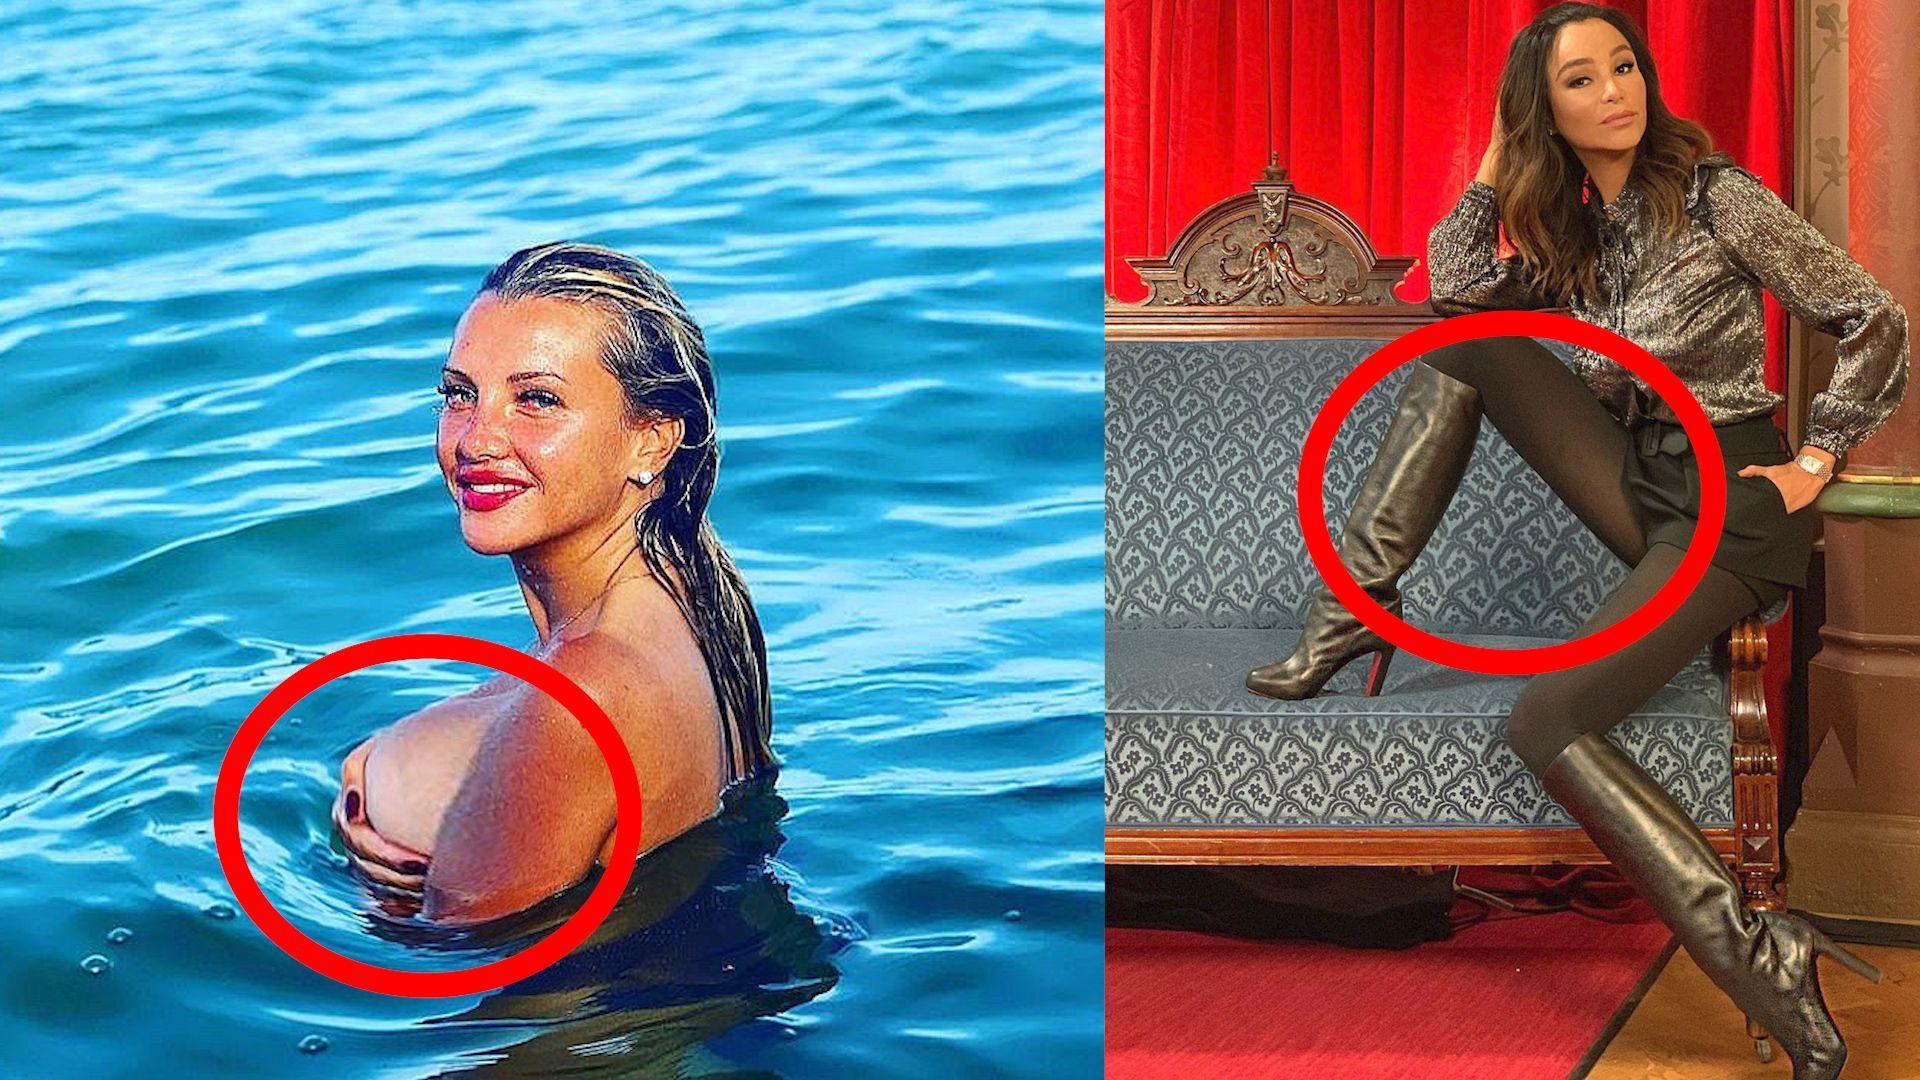 Nach Evelyn Burdecki jetzt auch Verona Pooth – Photoshop-fails